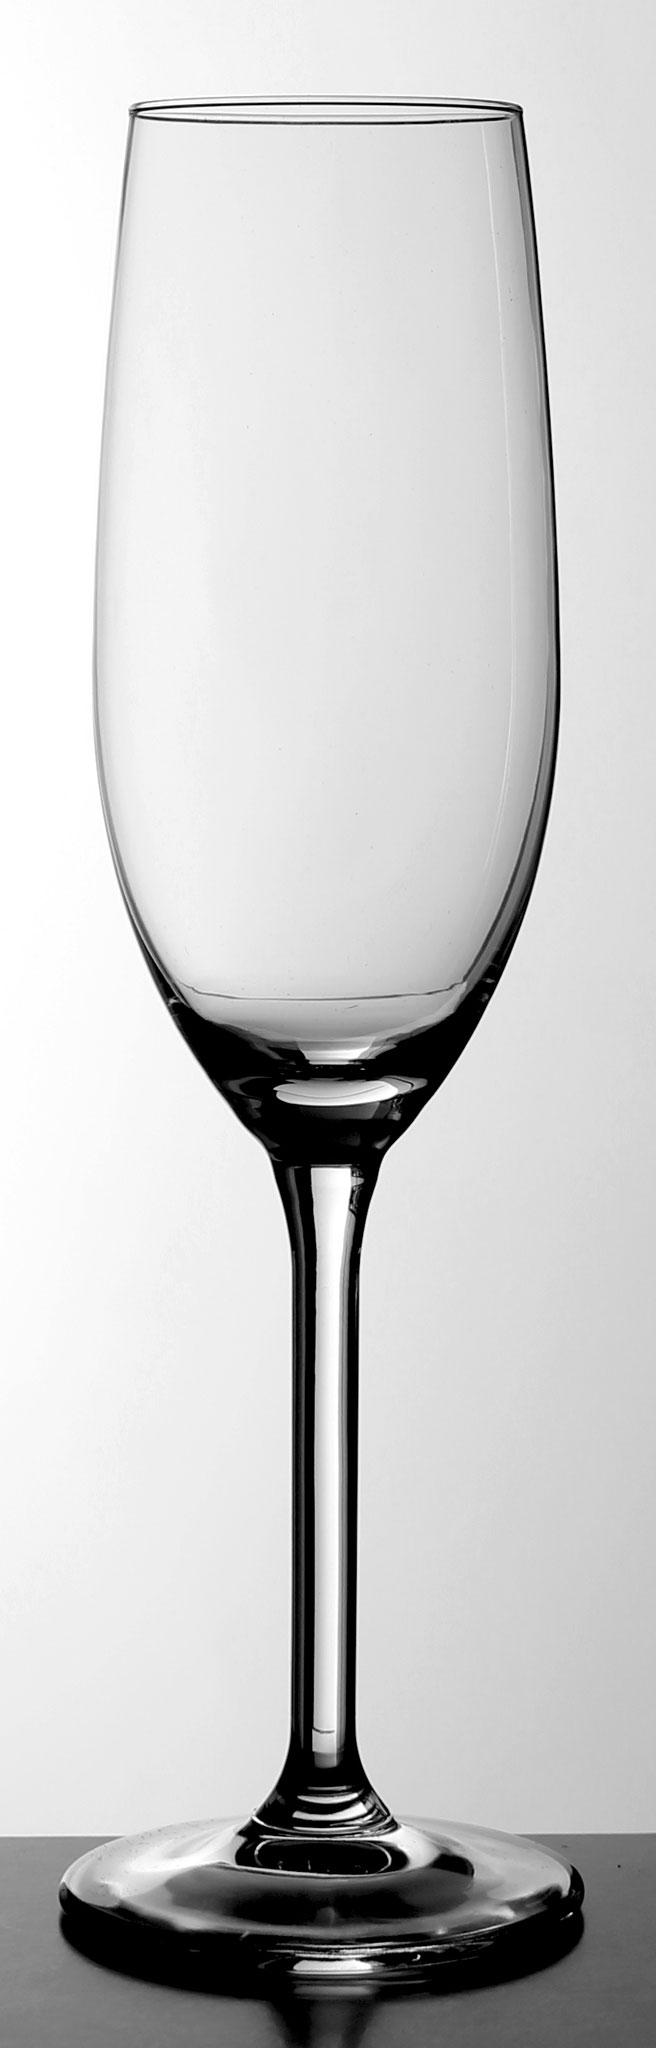 Clusive Sektglas 190 ml